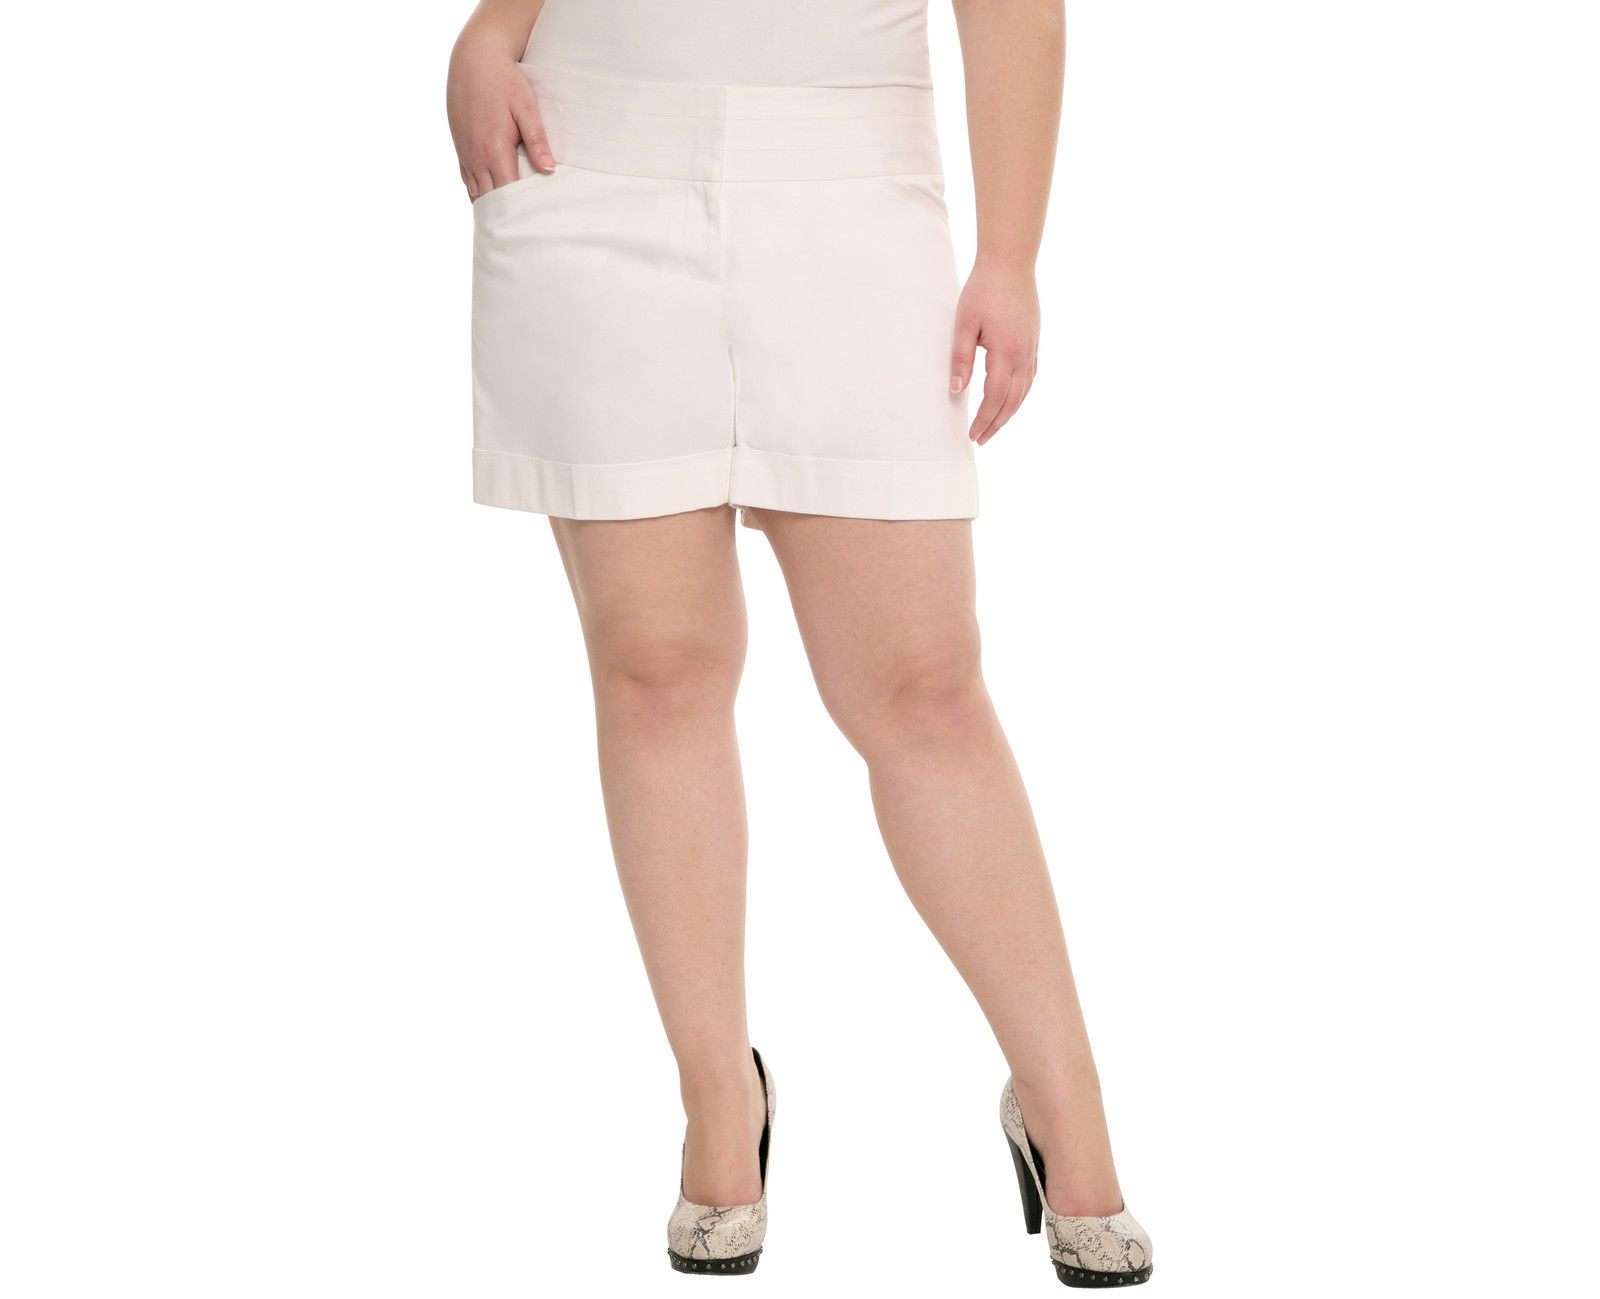 26 28 4X Torrid White Sateen Flat Front Short Shorts NWOT  - $19.32